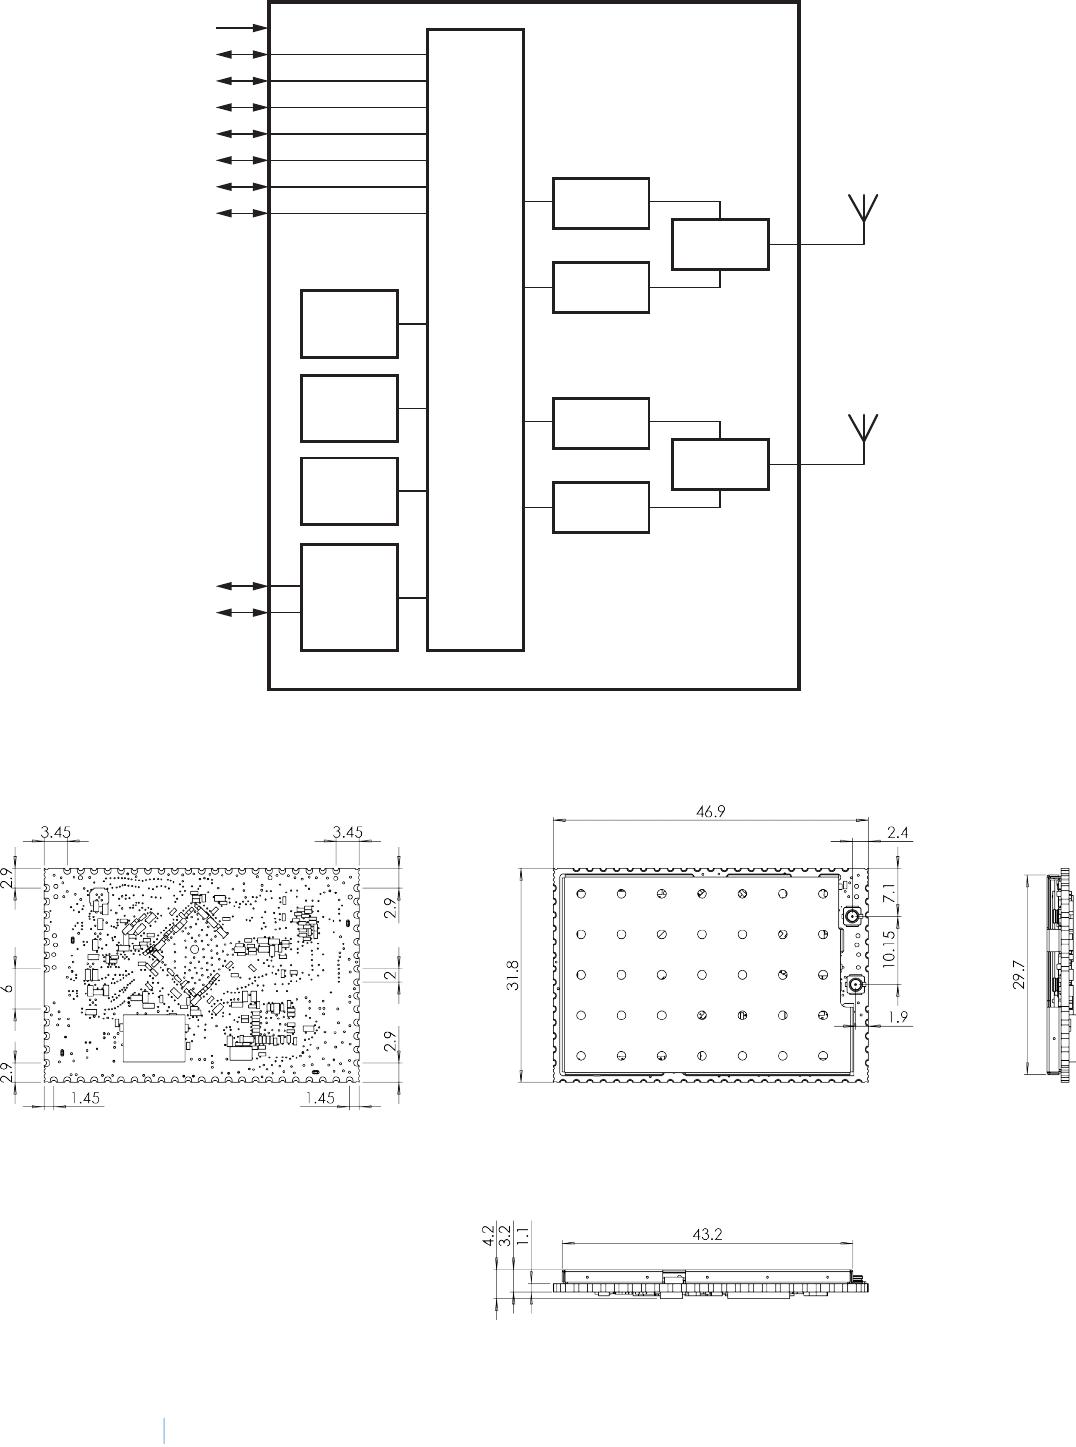 8devices JLP Broadband Digital Transmission System User Manual